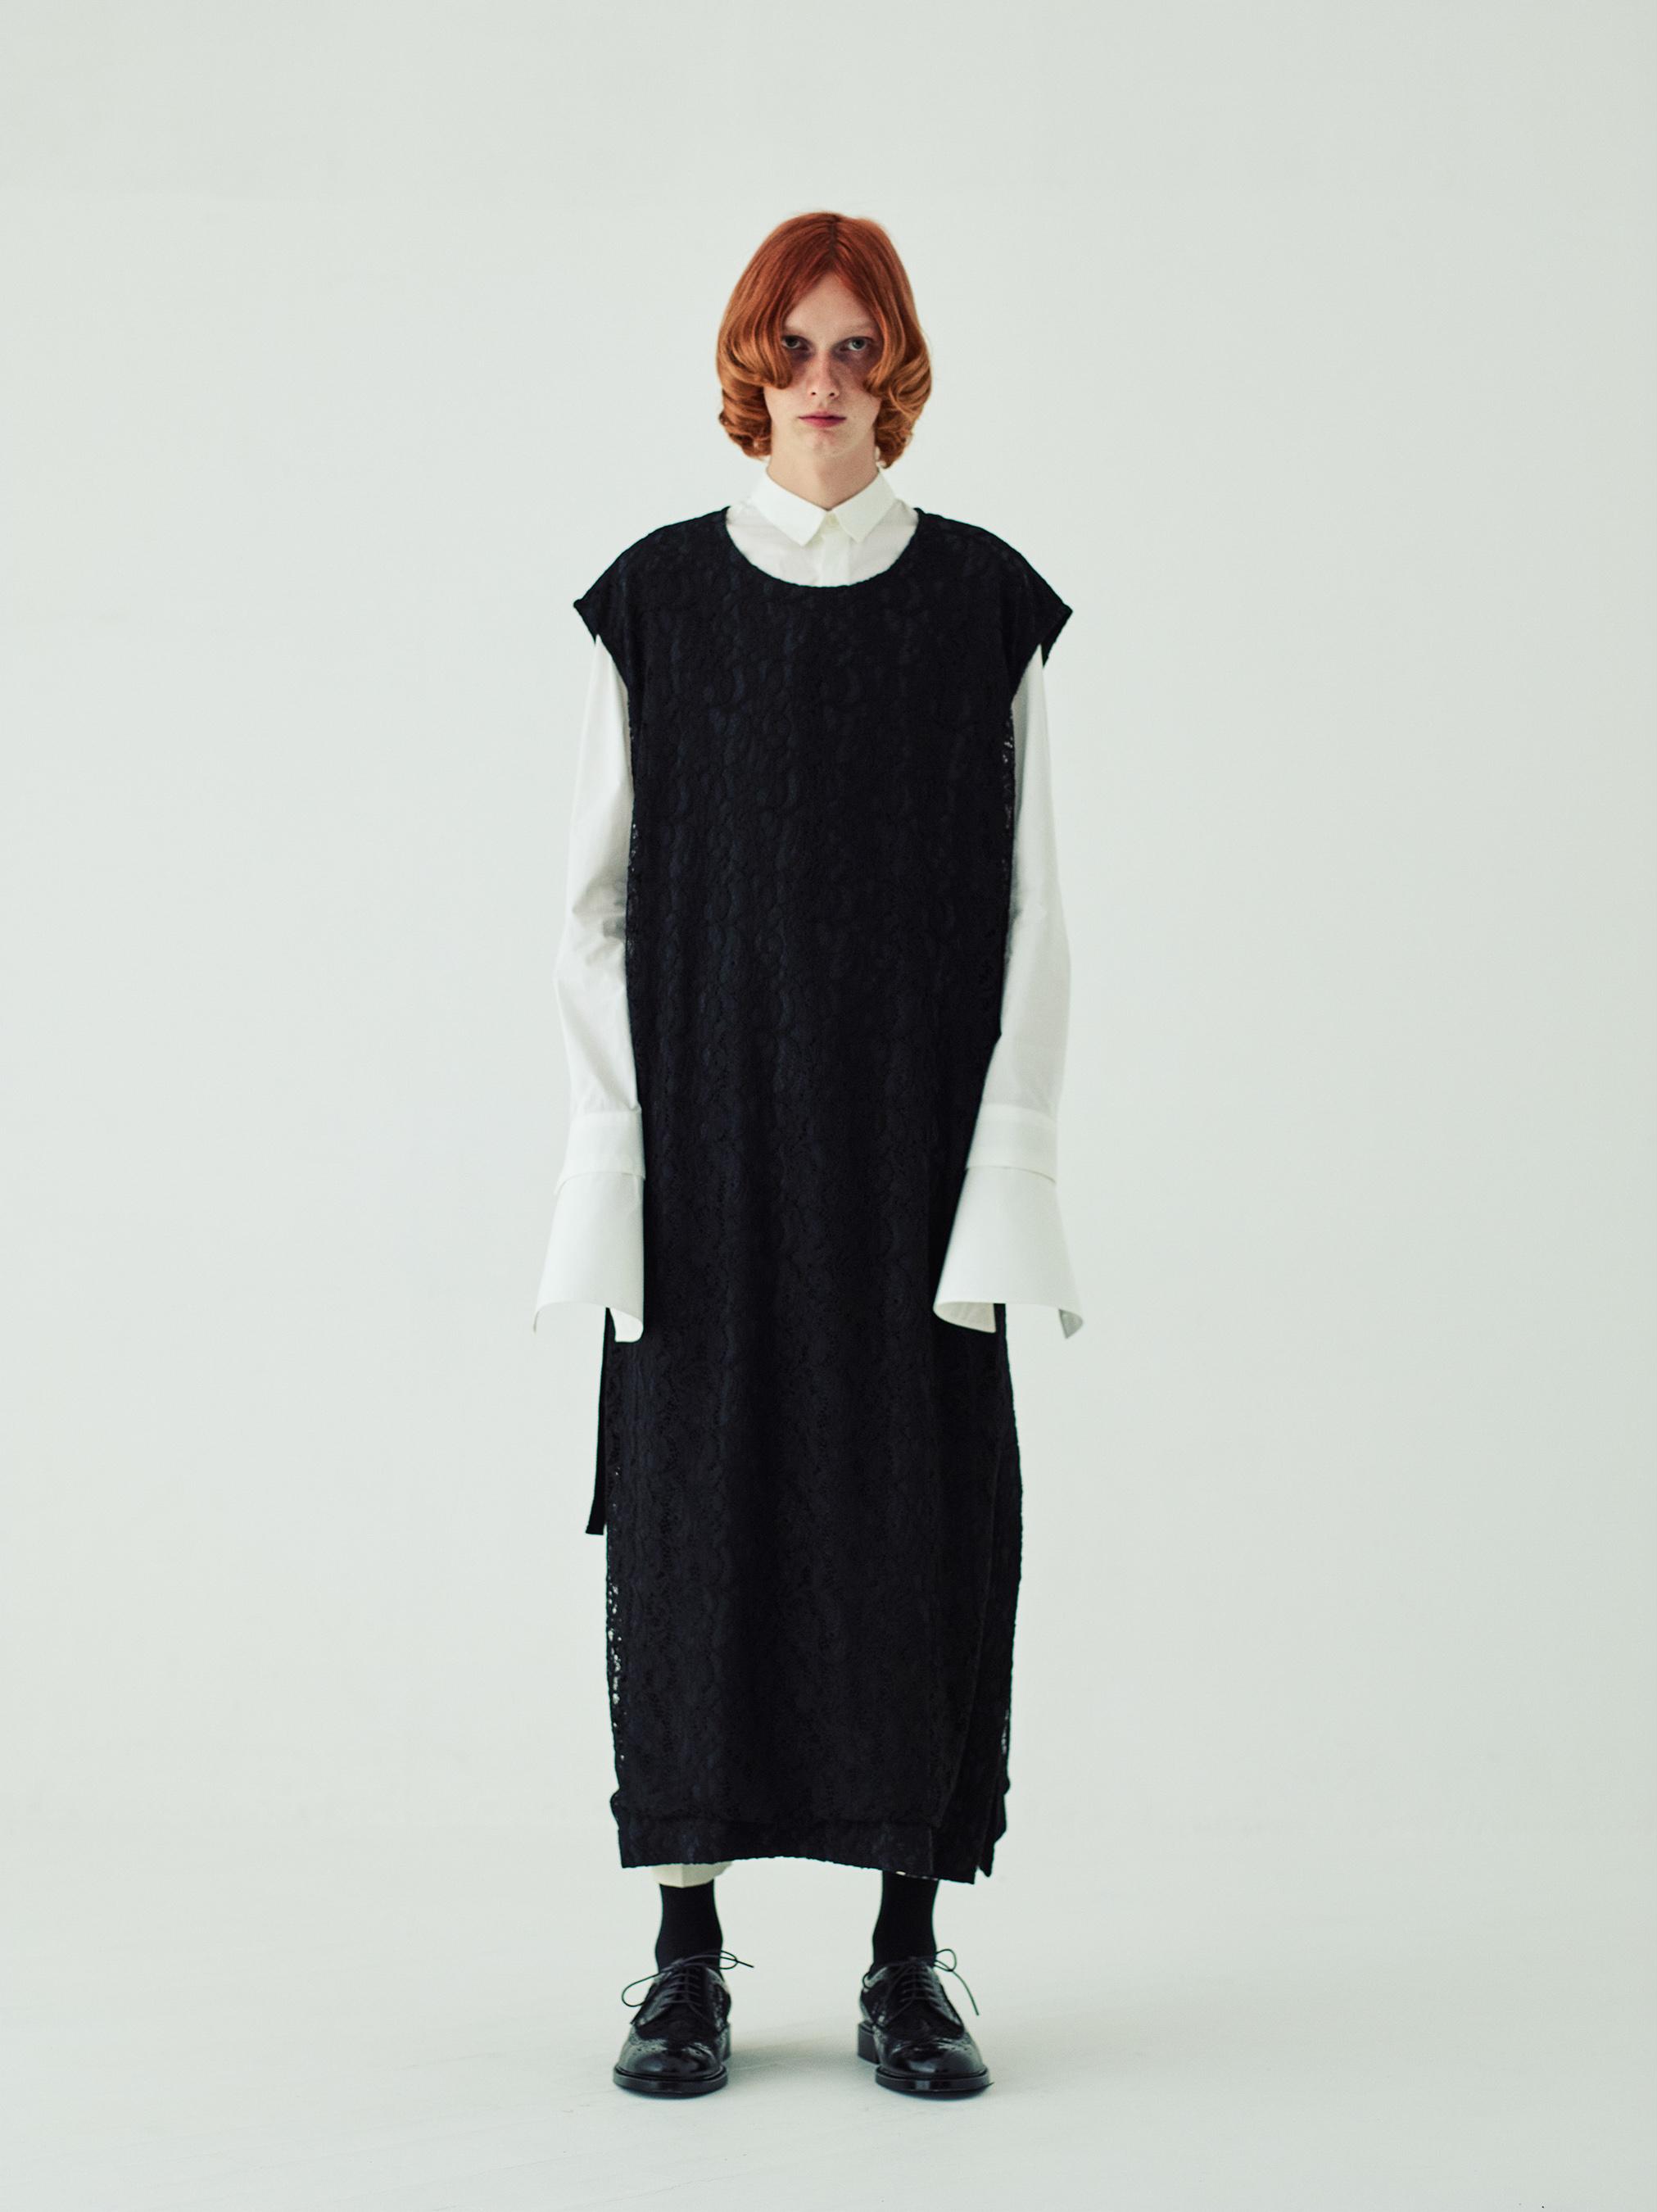 Apocrypha Spring 2021 Fashion Show